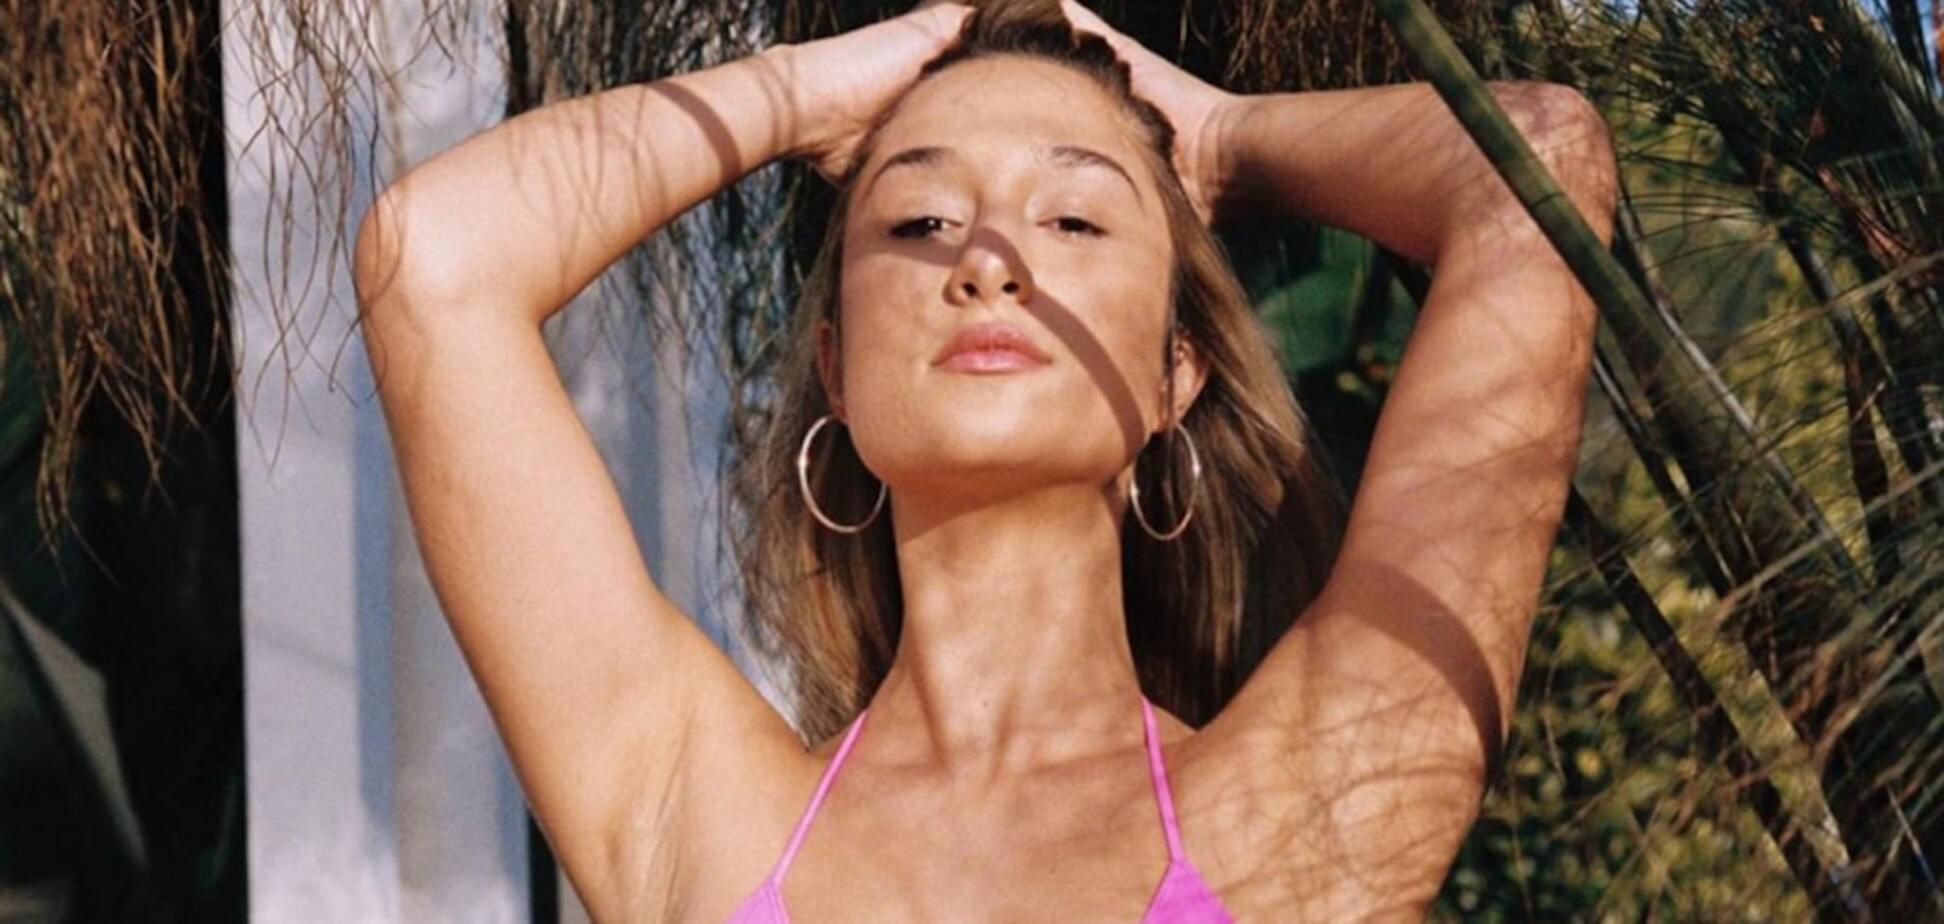 Саванна Монтано позирует в розовом купальнике